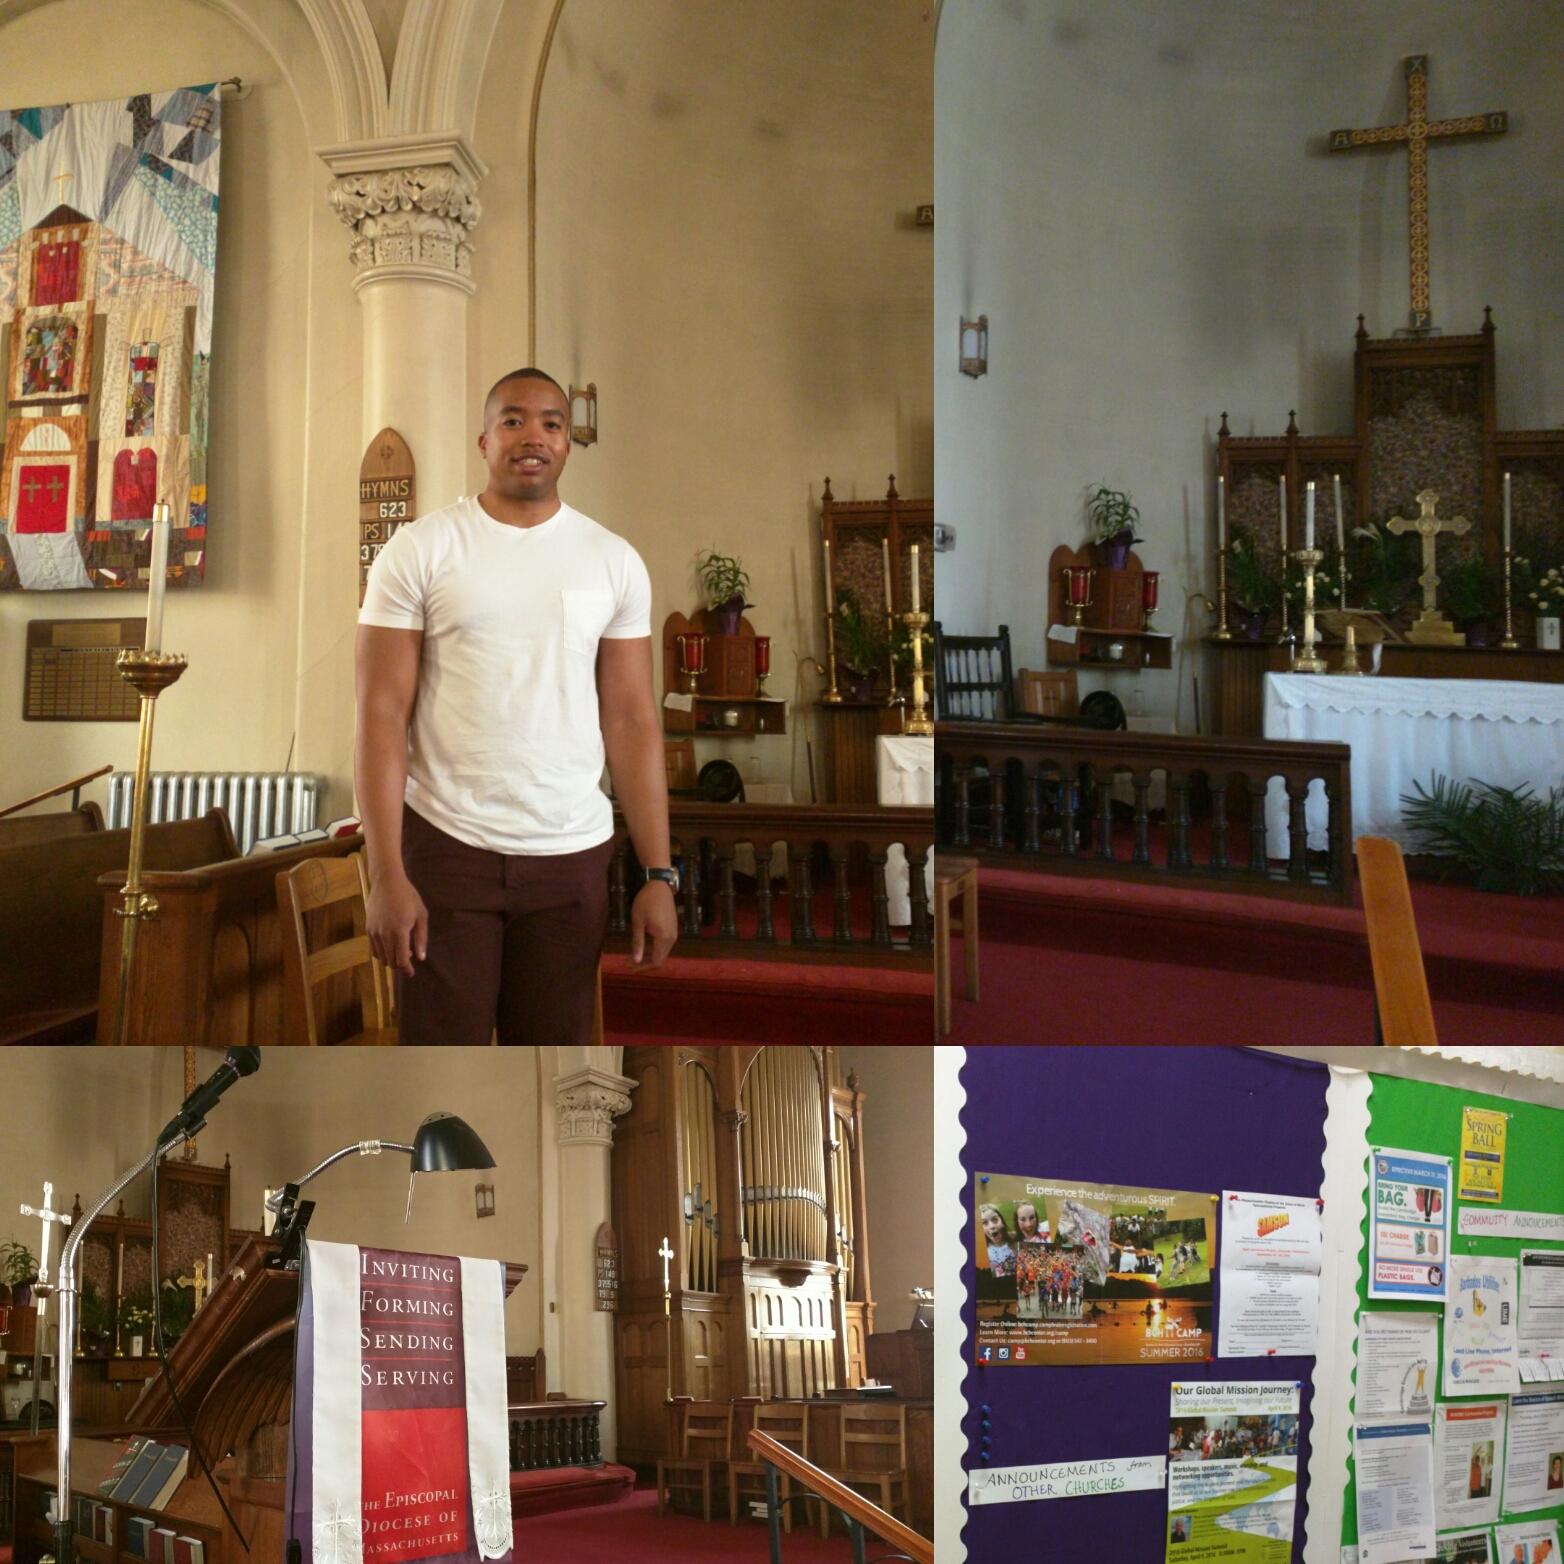 Wayne Jones, Micah Fellow at St. Bartholomew's Episcopal Church, Cambridge